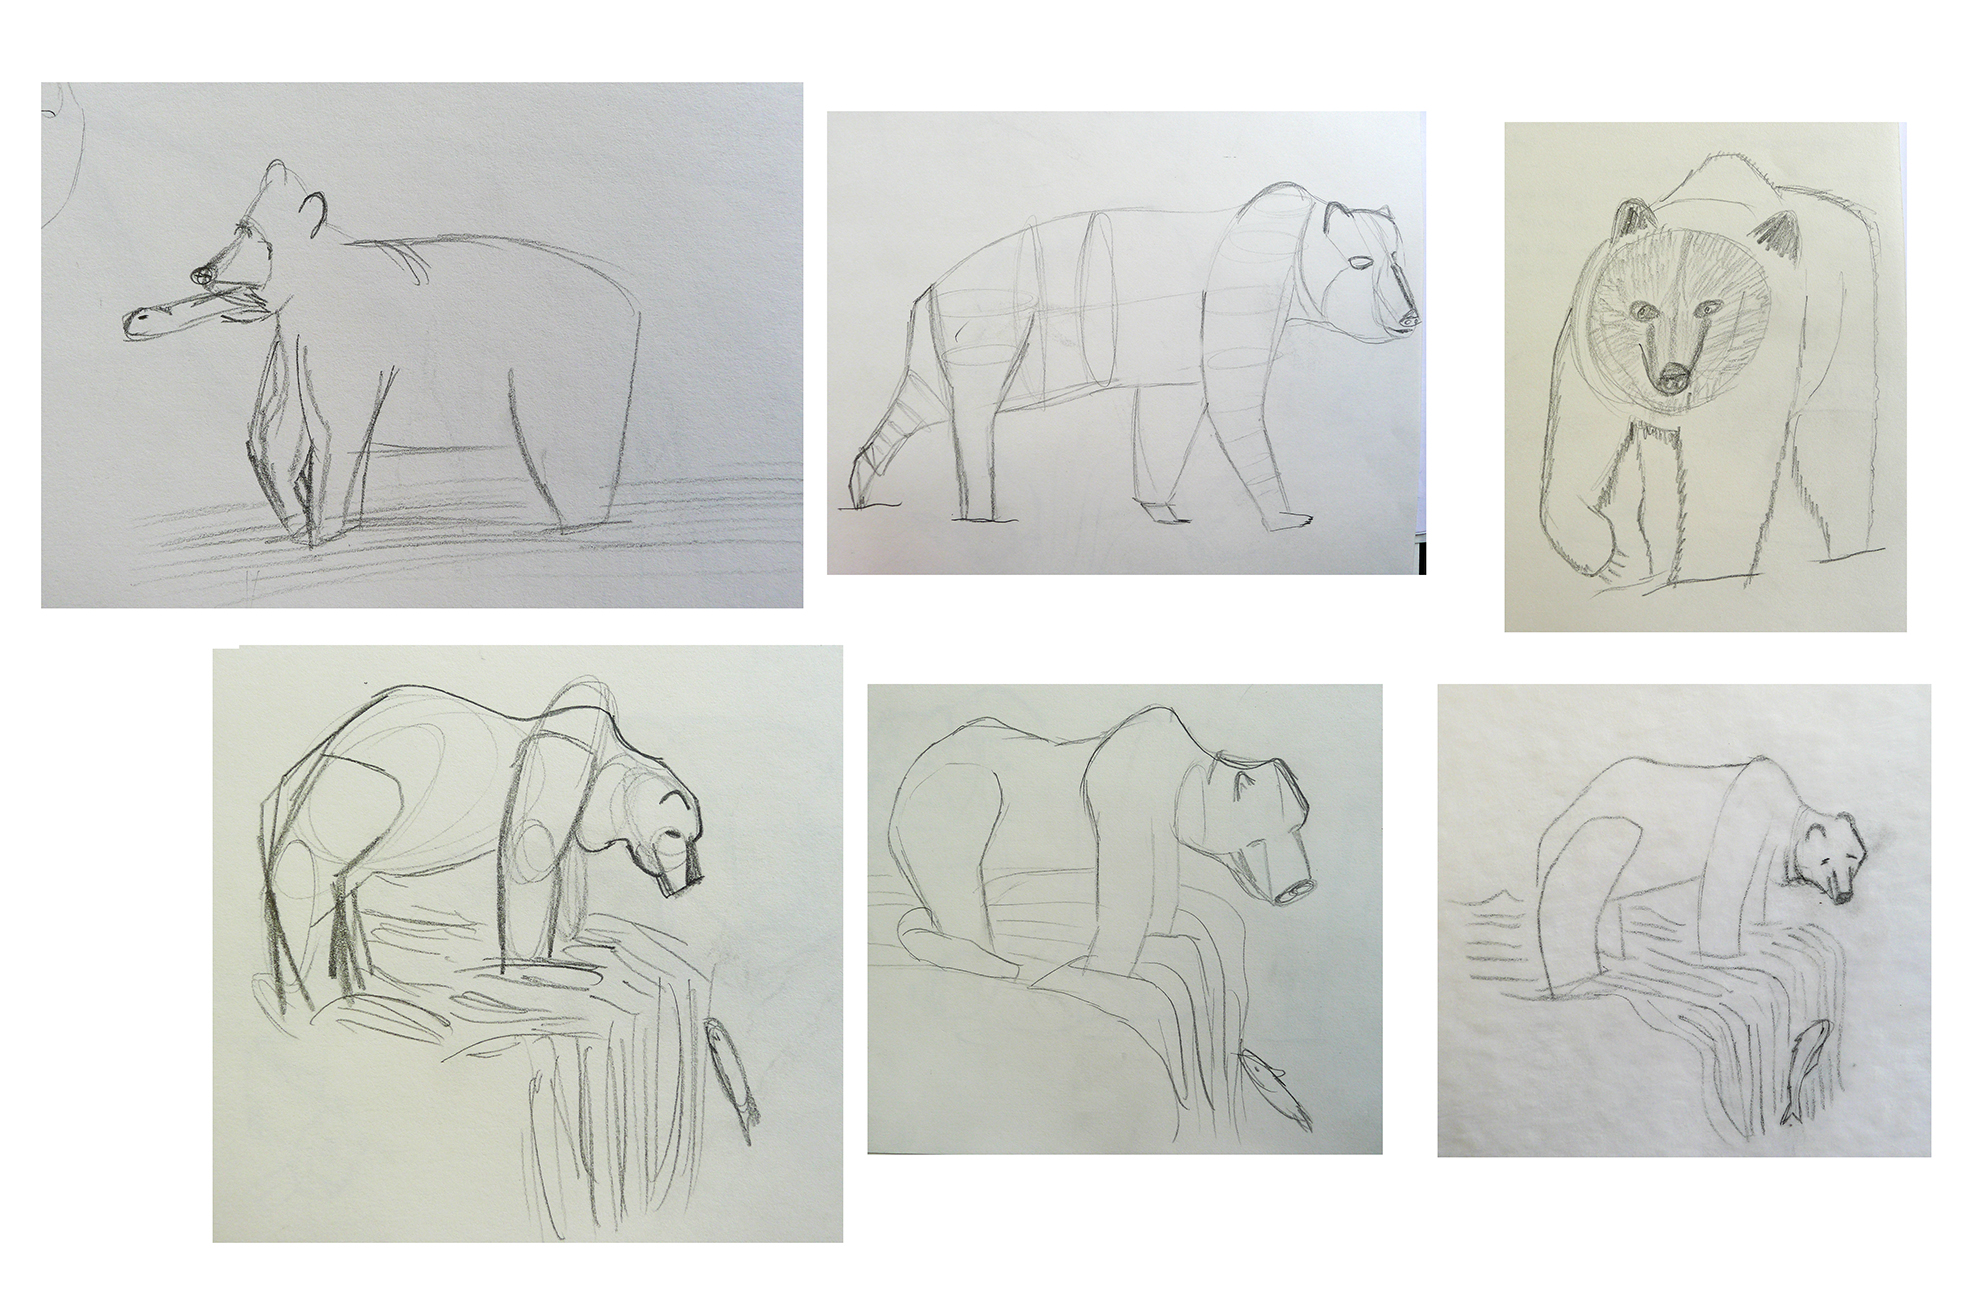 bear-sketches2.jpg